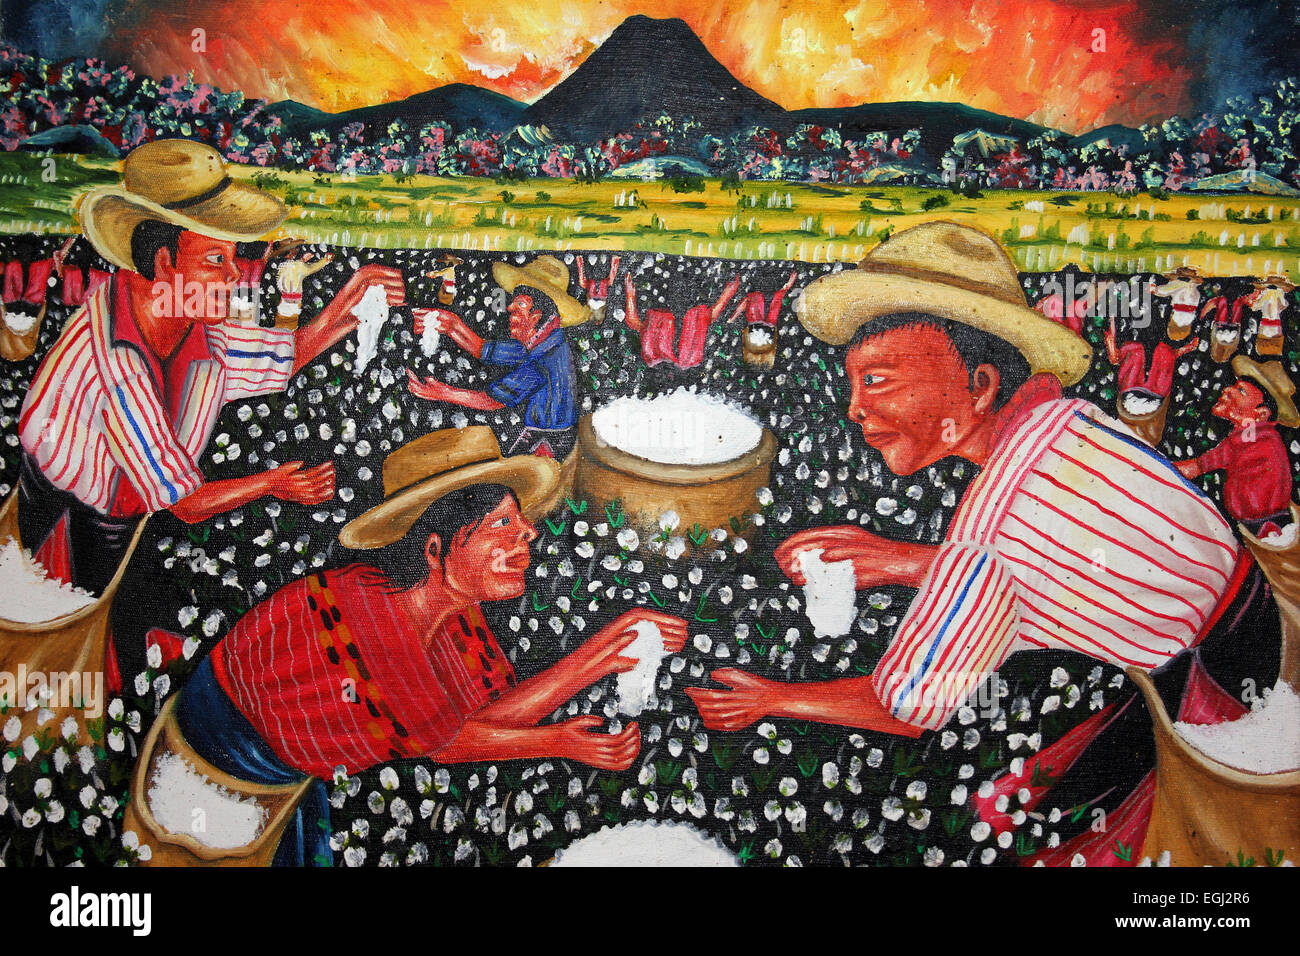 Guatemala la peinture à l'huile montrant Cotton Pickers Photo Stock